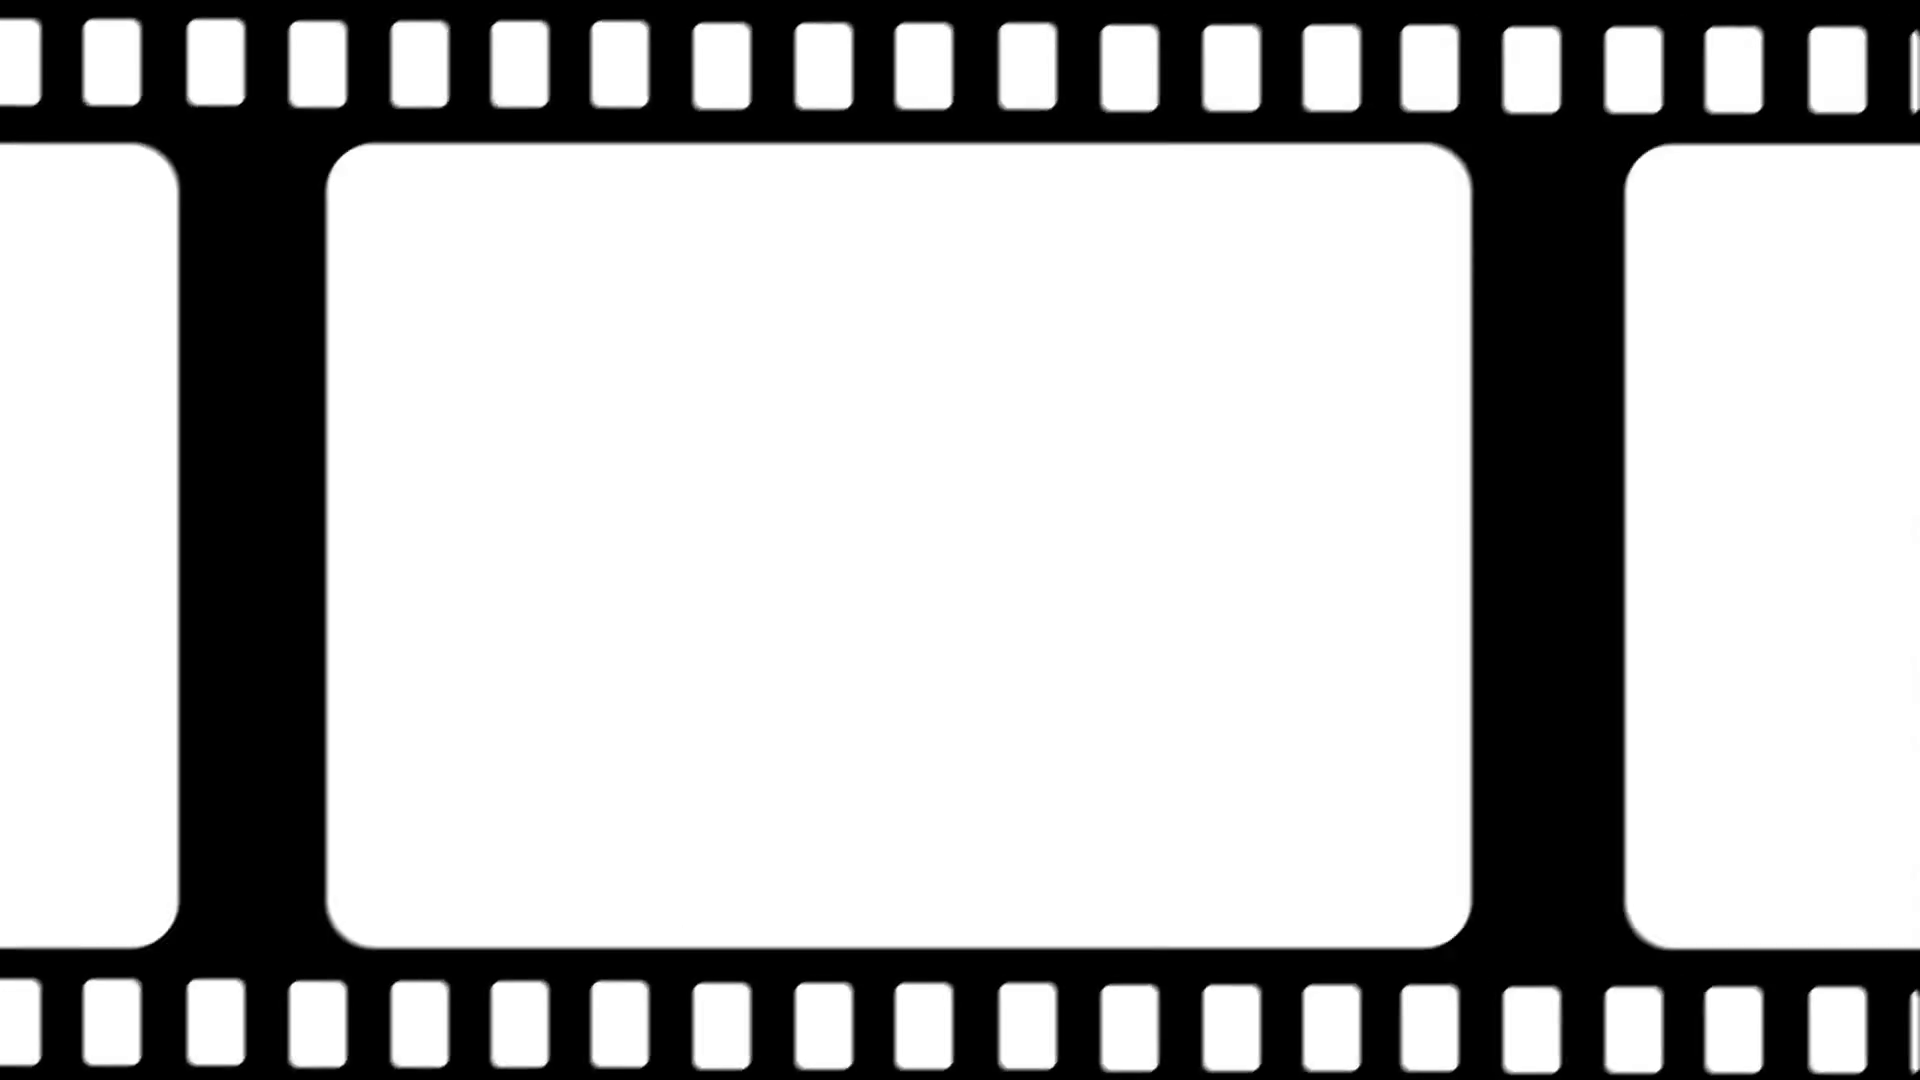 Film Reel PNG - 64812